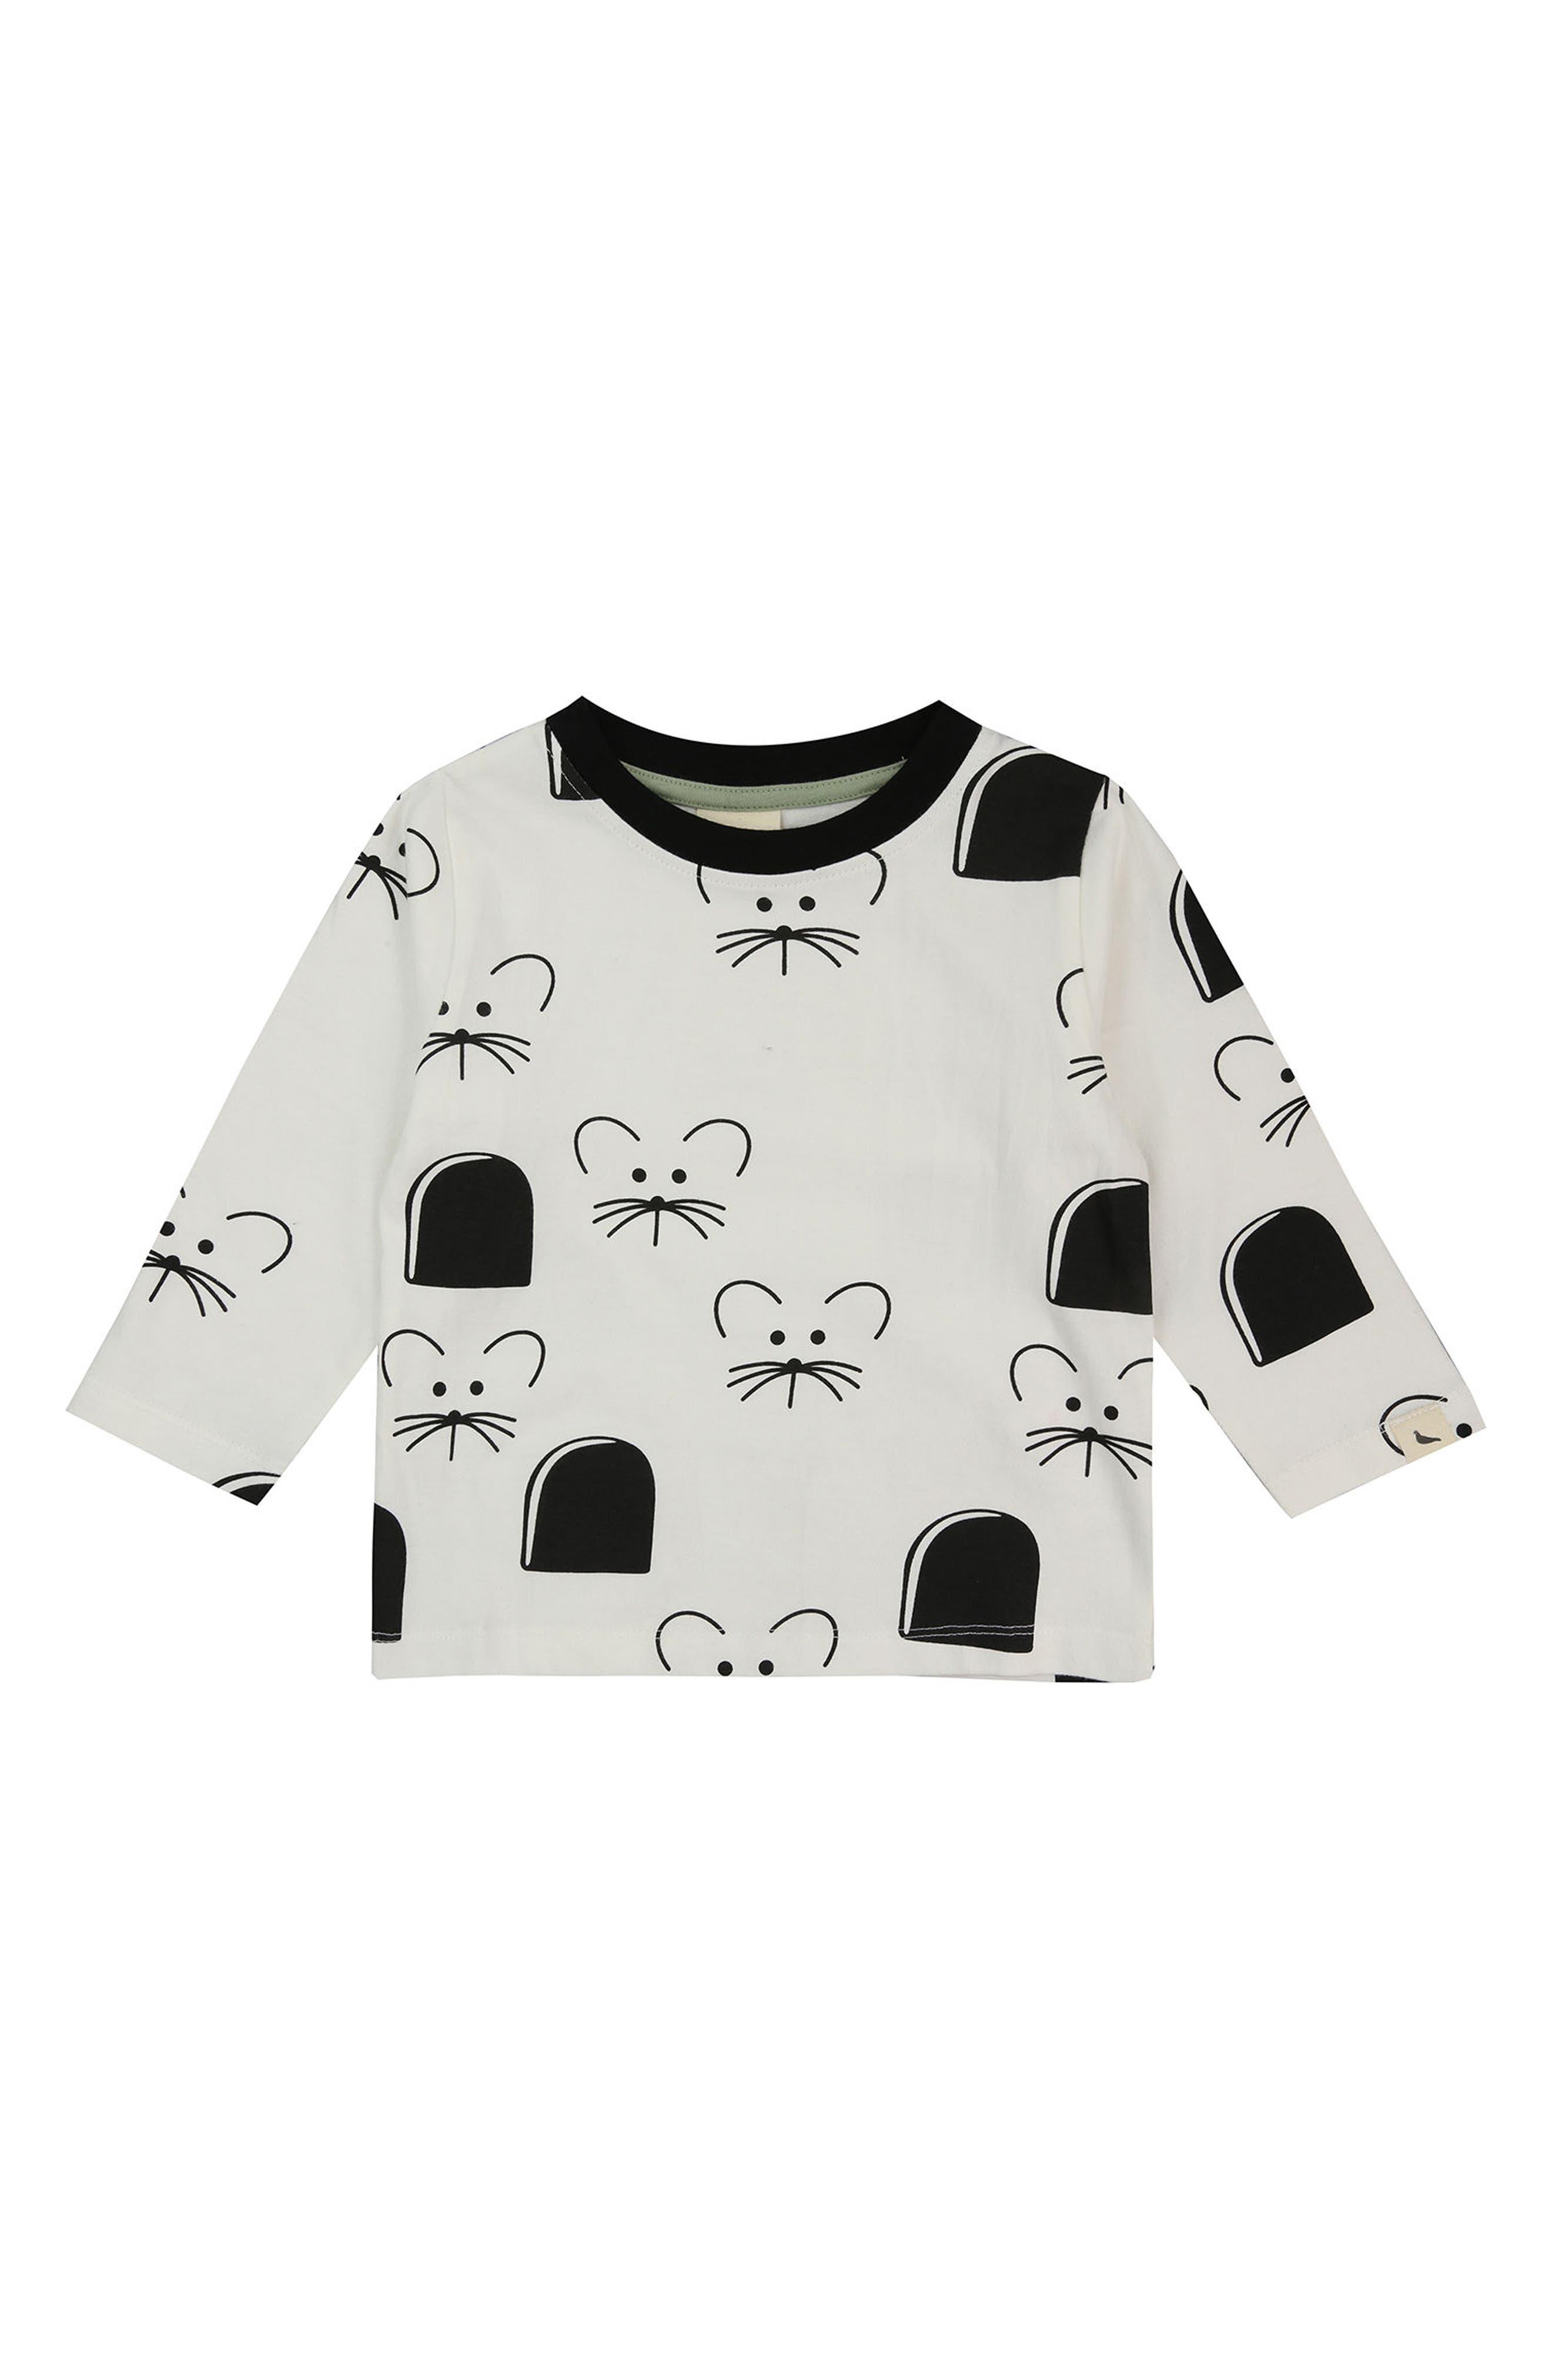 Mouse House Organic Cotton Shirt,                             Main thumbnail 1, color,                             100